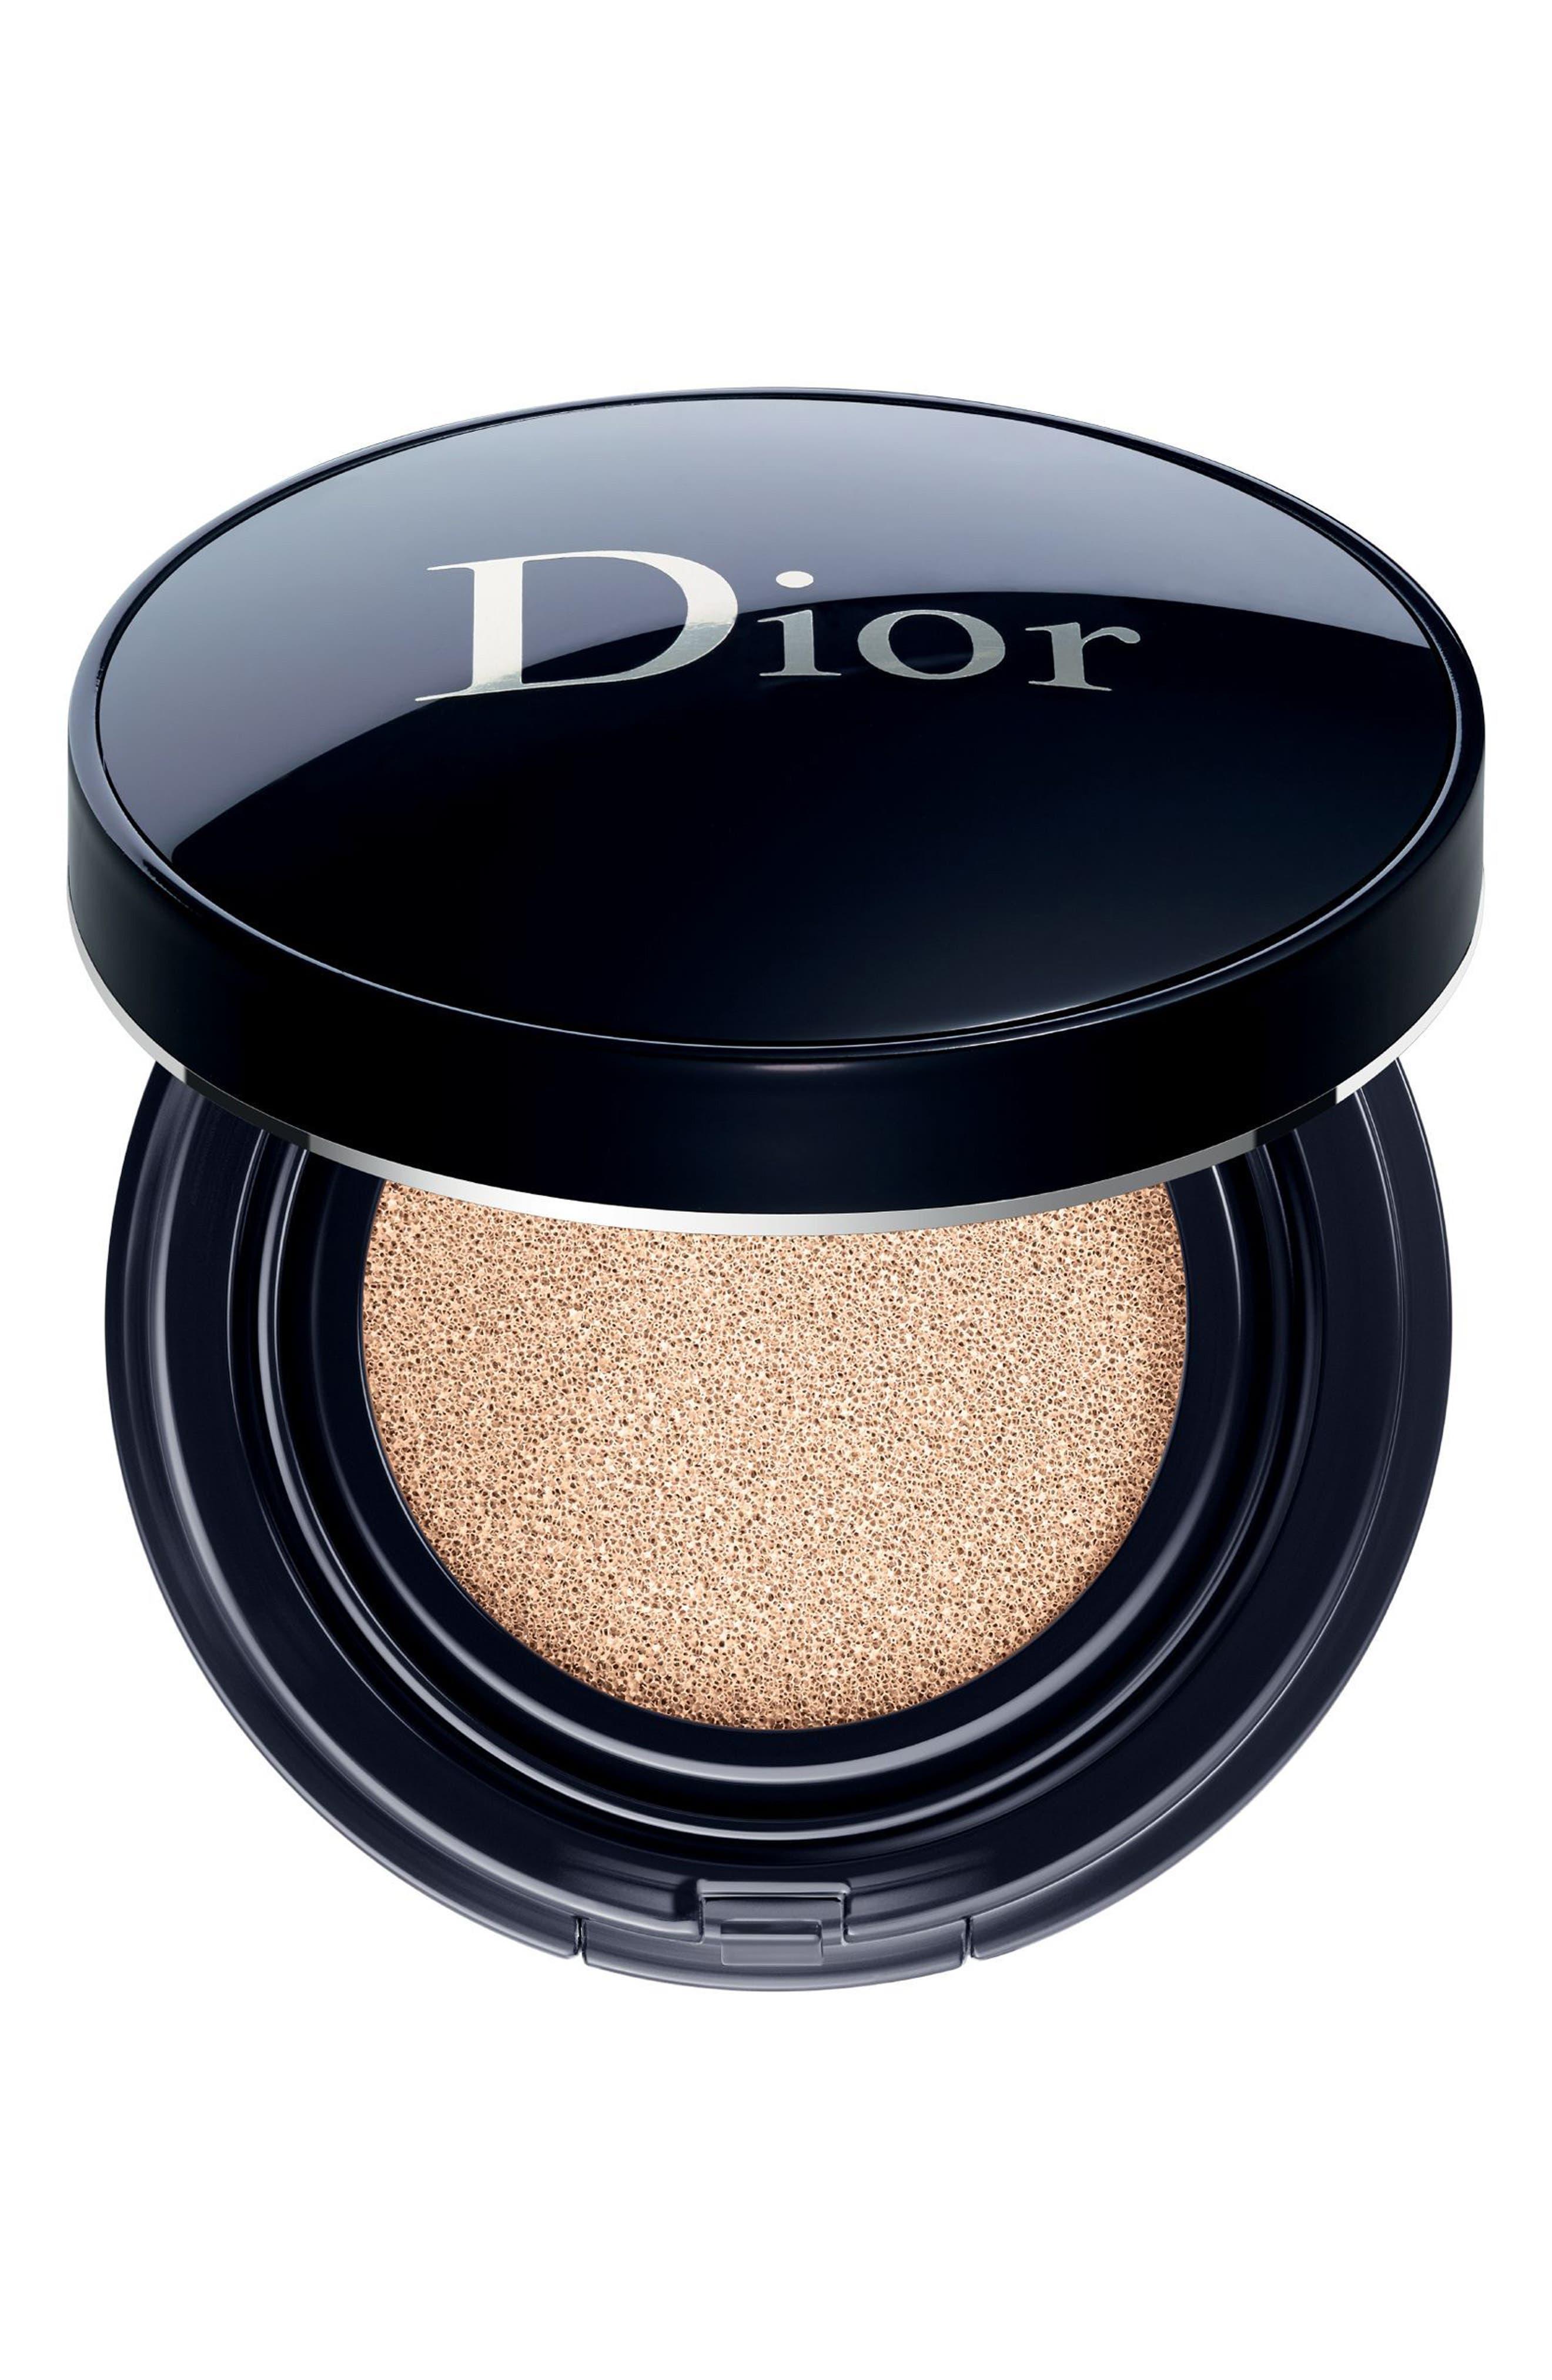 Dior Diorskin Forever Perfect Cushion Foundation Broad Spectrum Spf 35 - 011 Cream